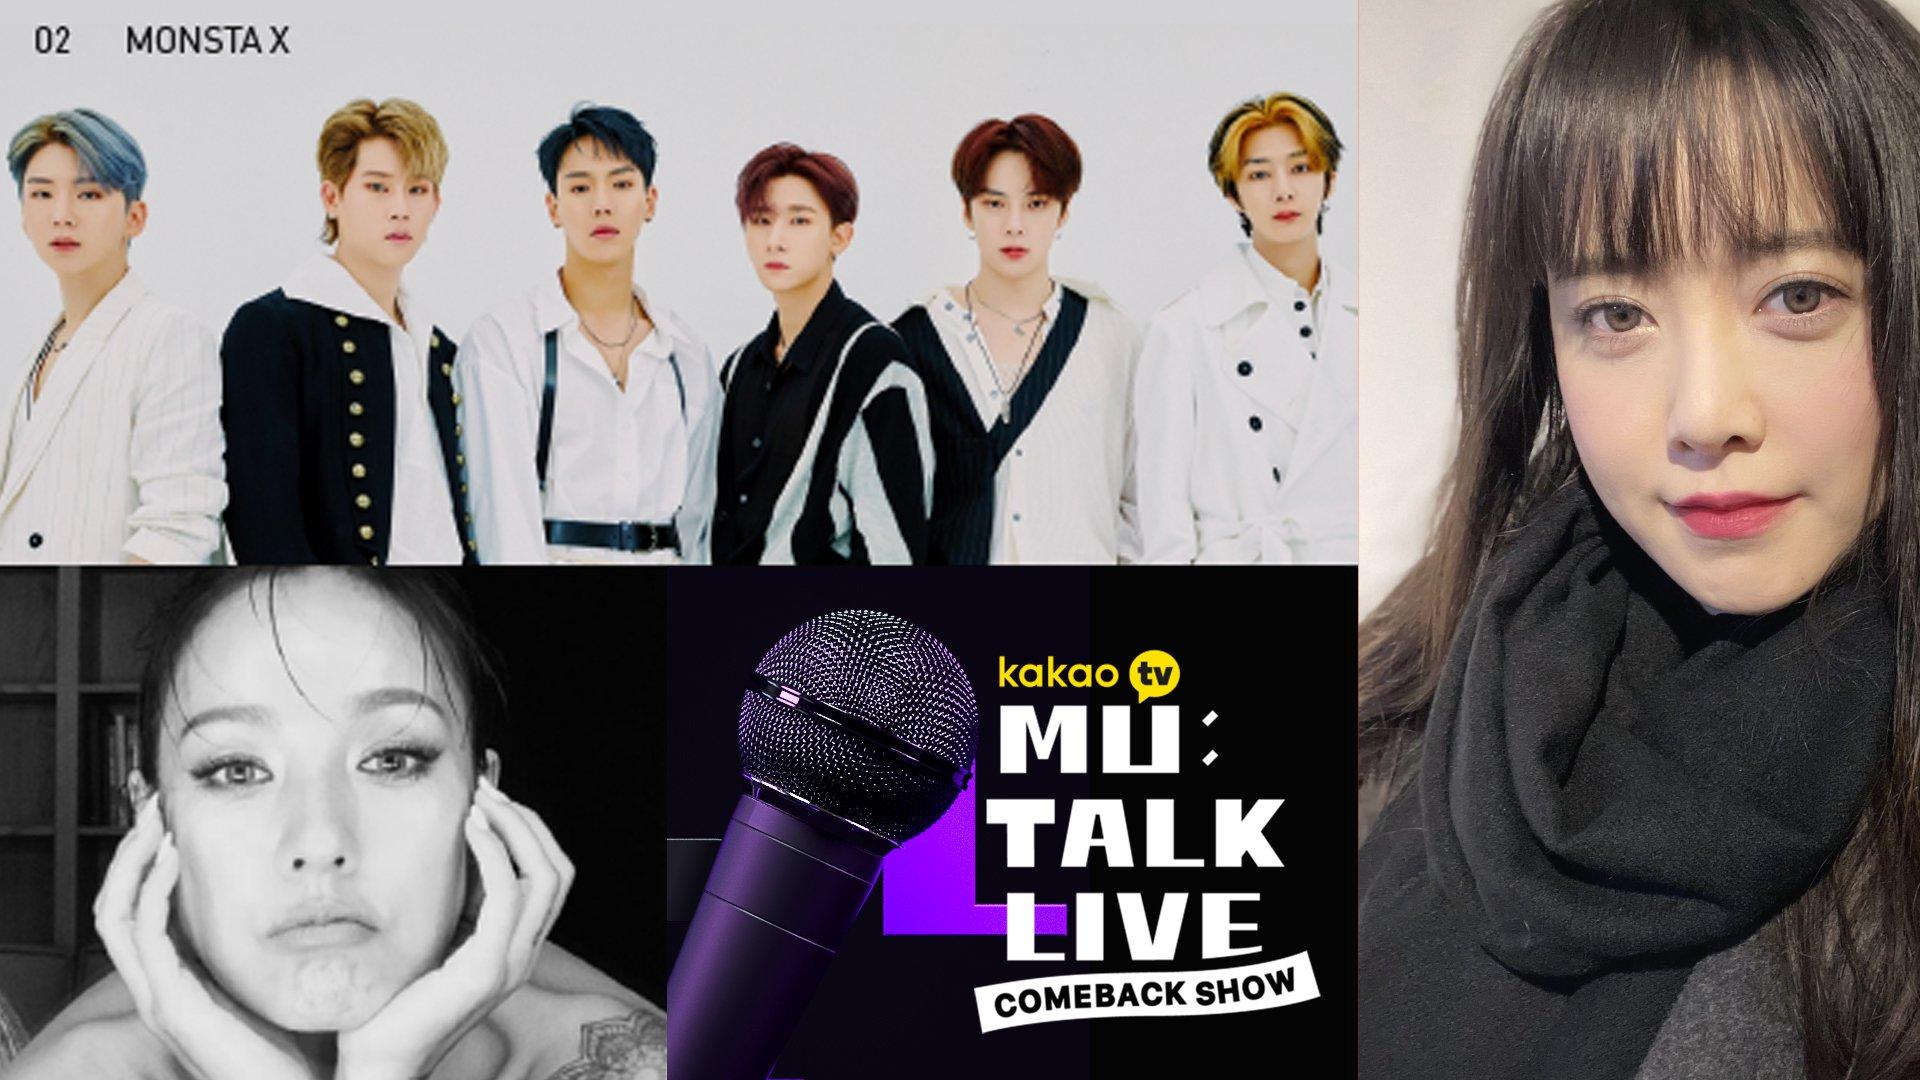 MU: Talk Live 回归秀